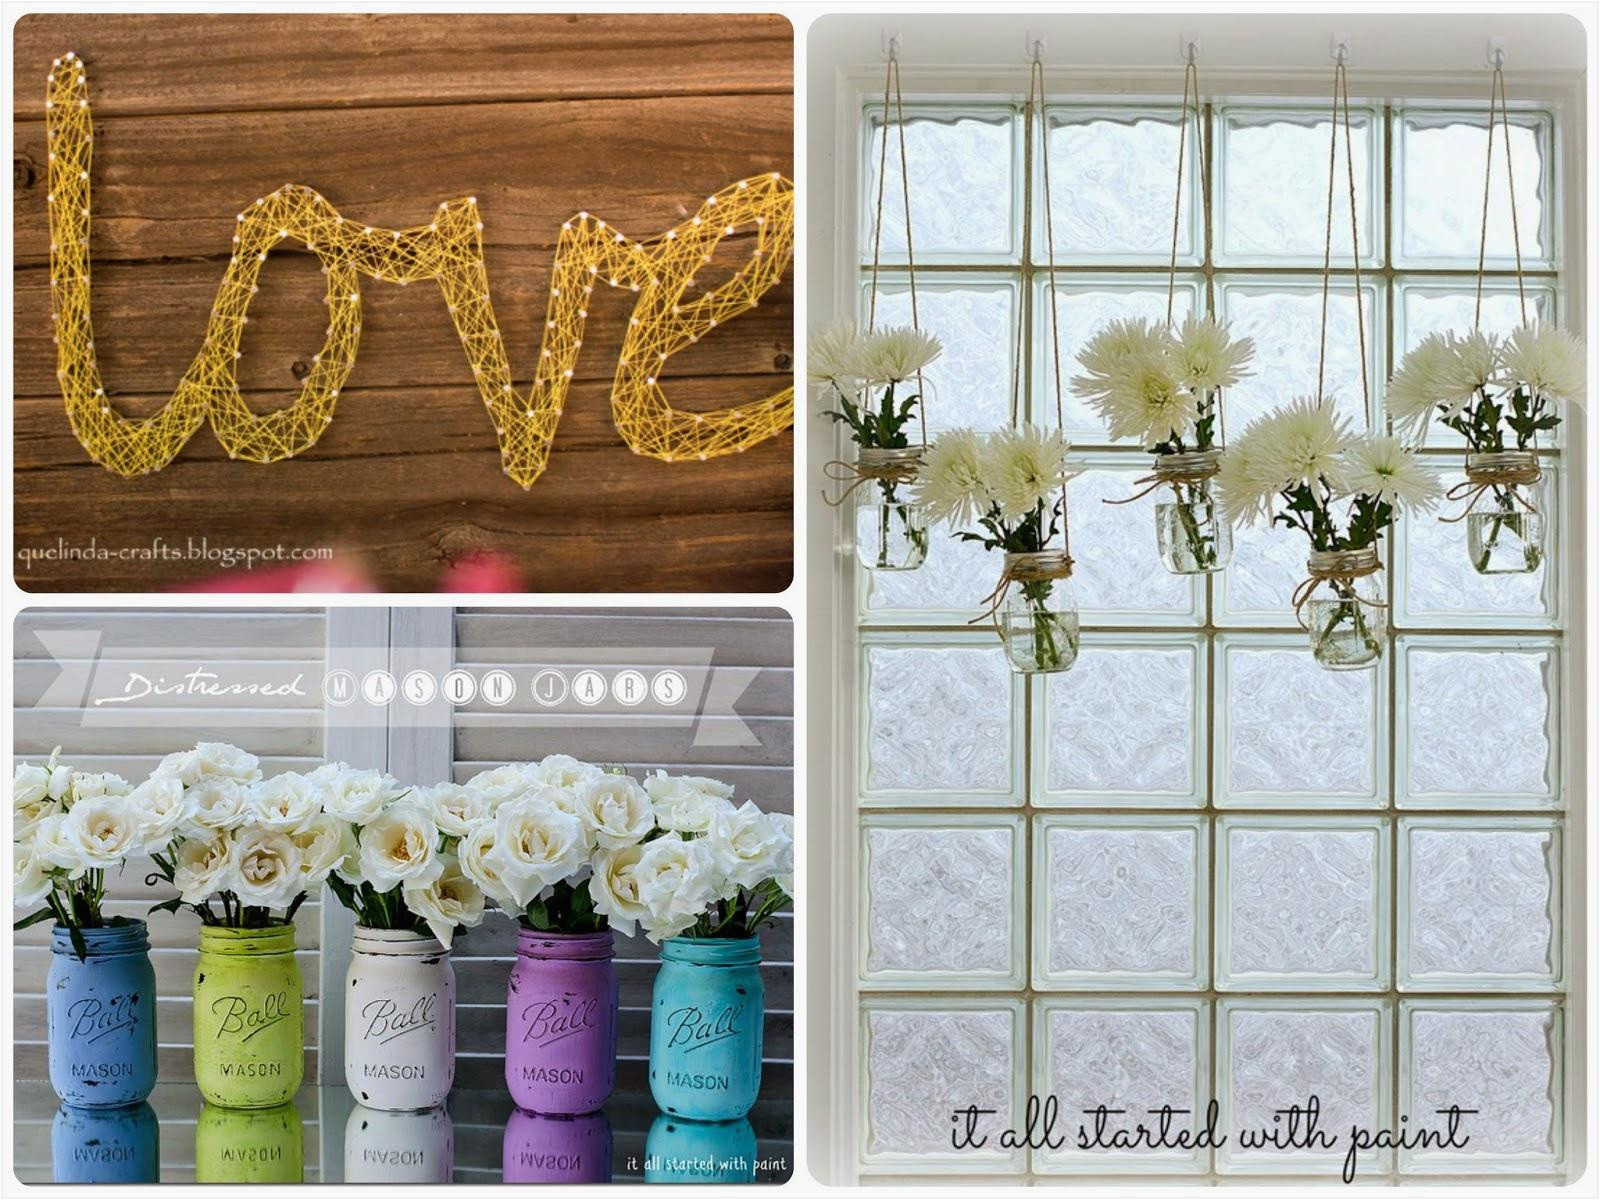 decoracion sencilla para matrimonio civil en casa decoracion jardin boda civil decoracion original para bodas finest